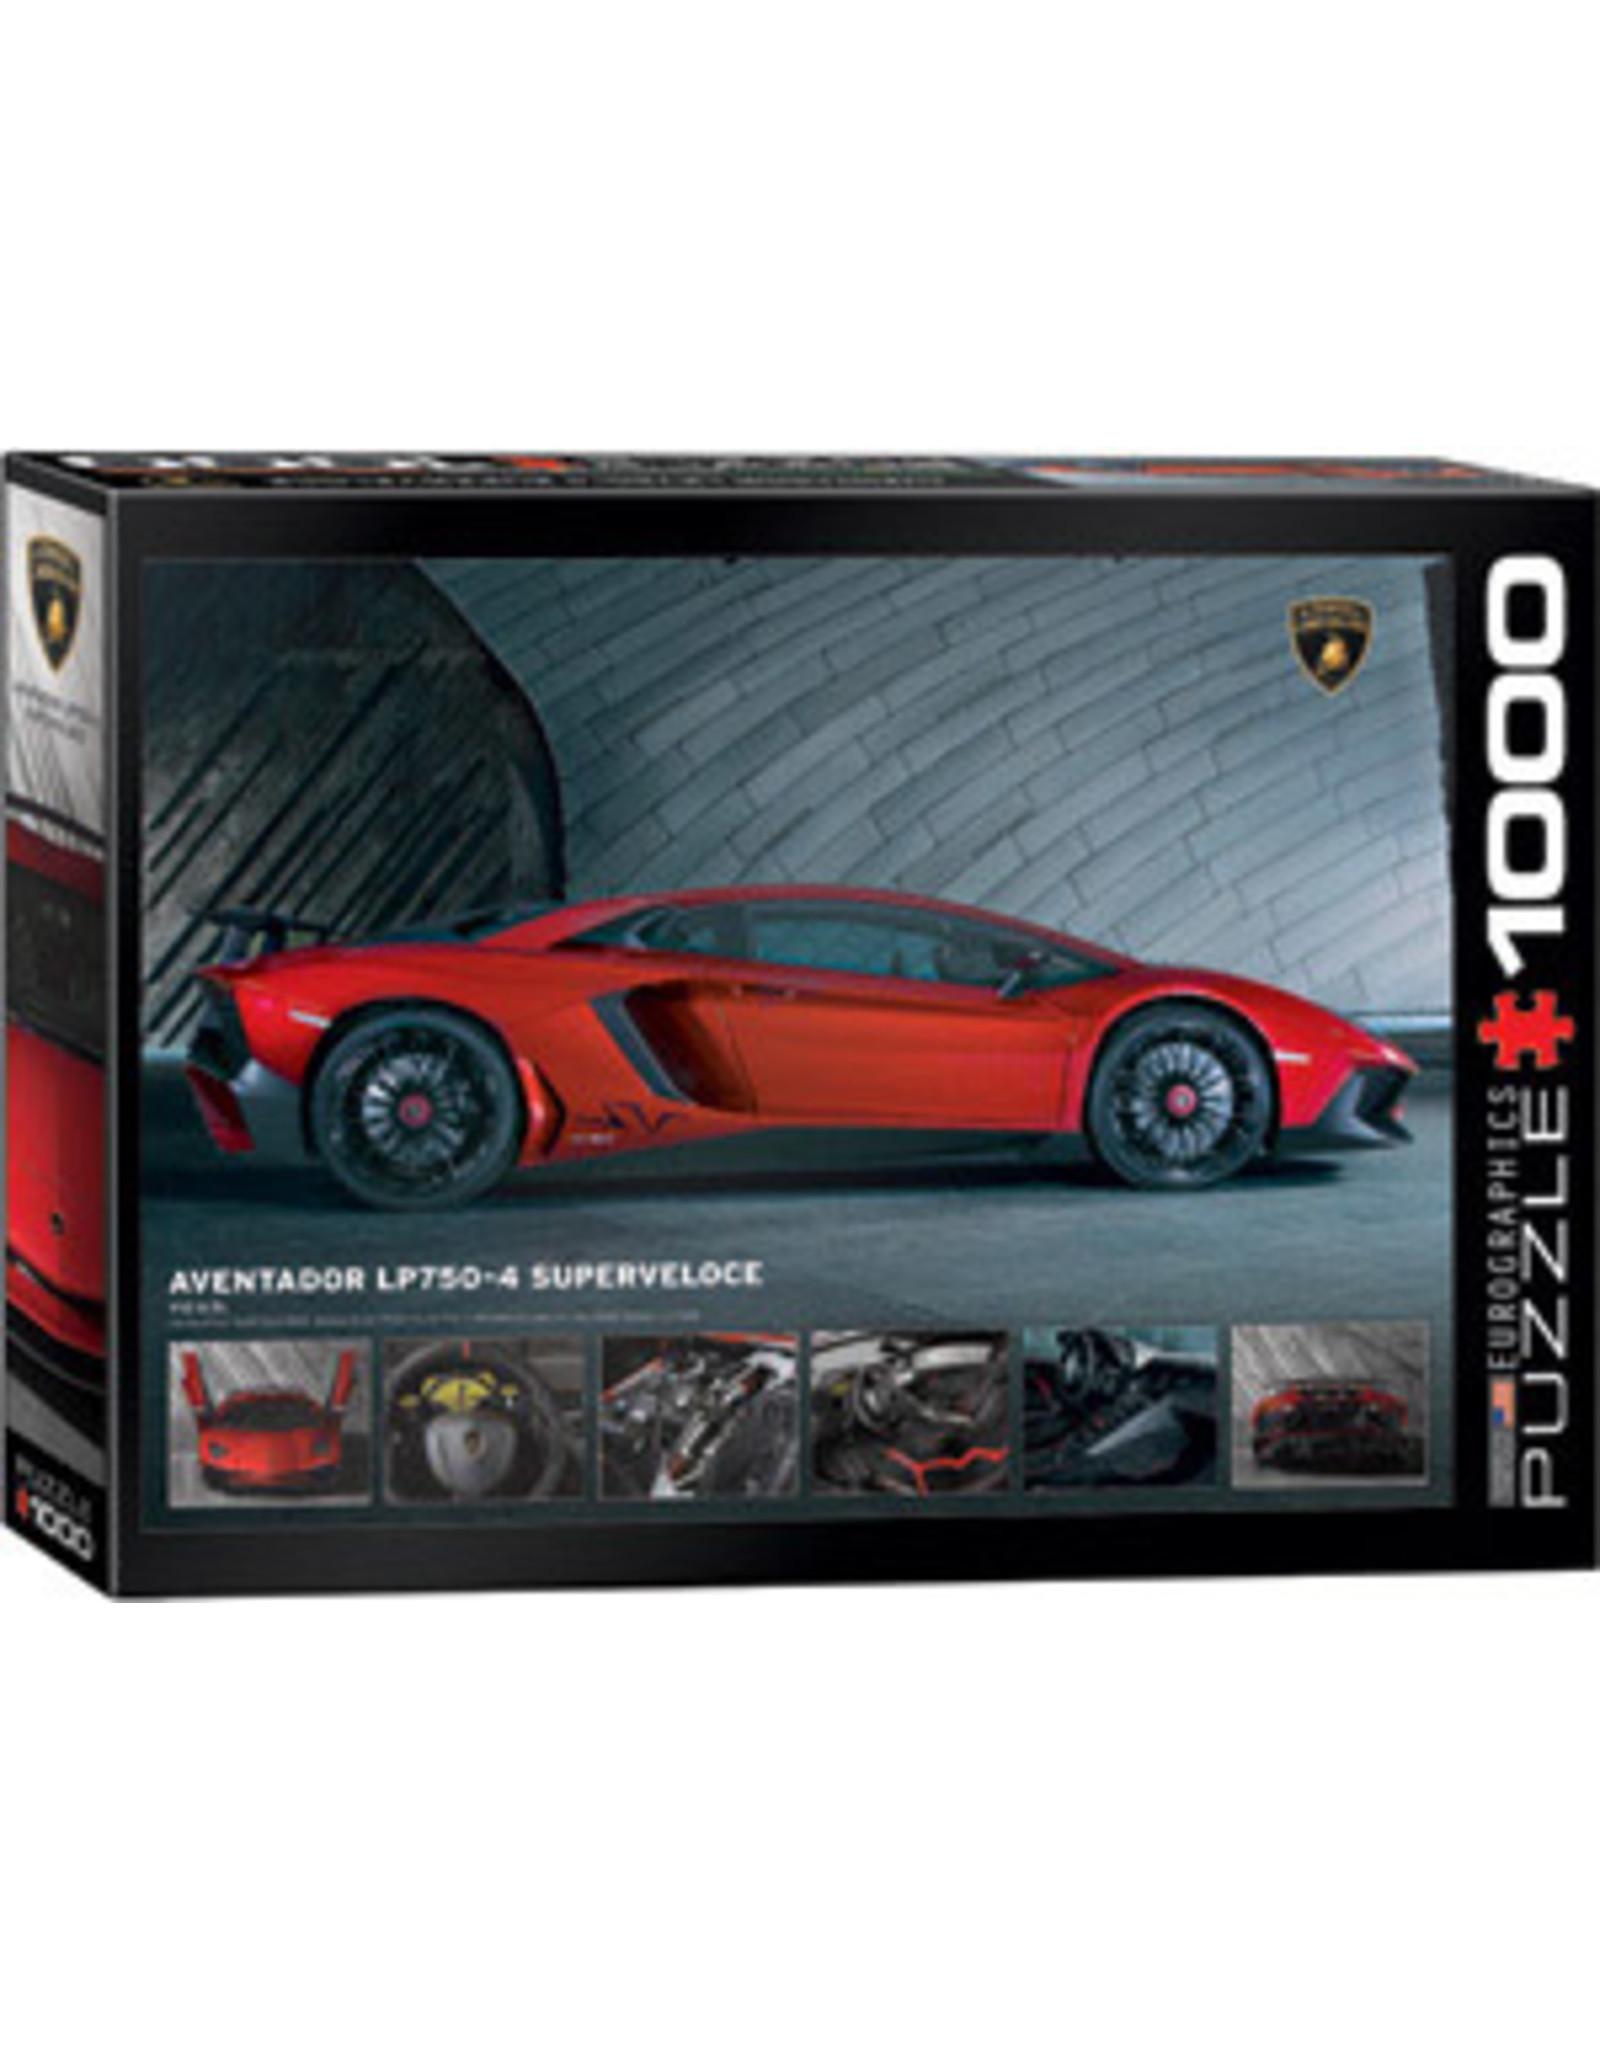 Eurographics Lamborghini Aventador LP750-4 Superveloce